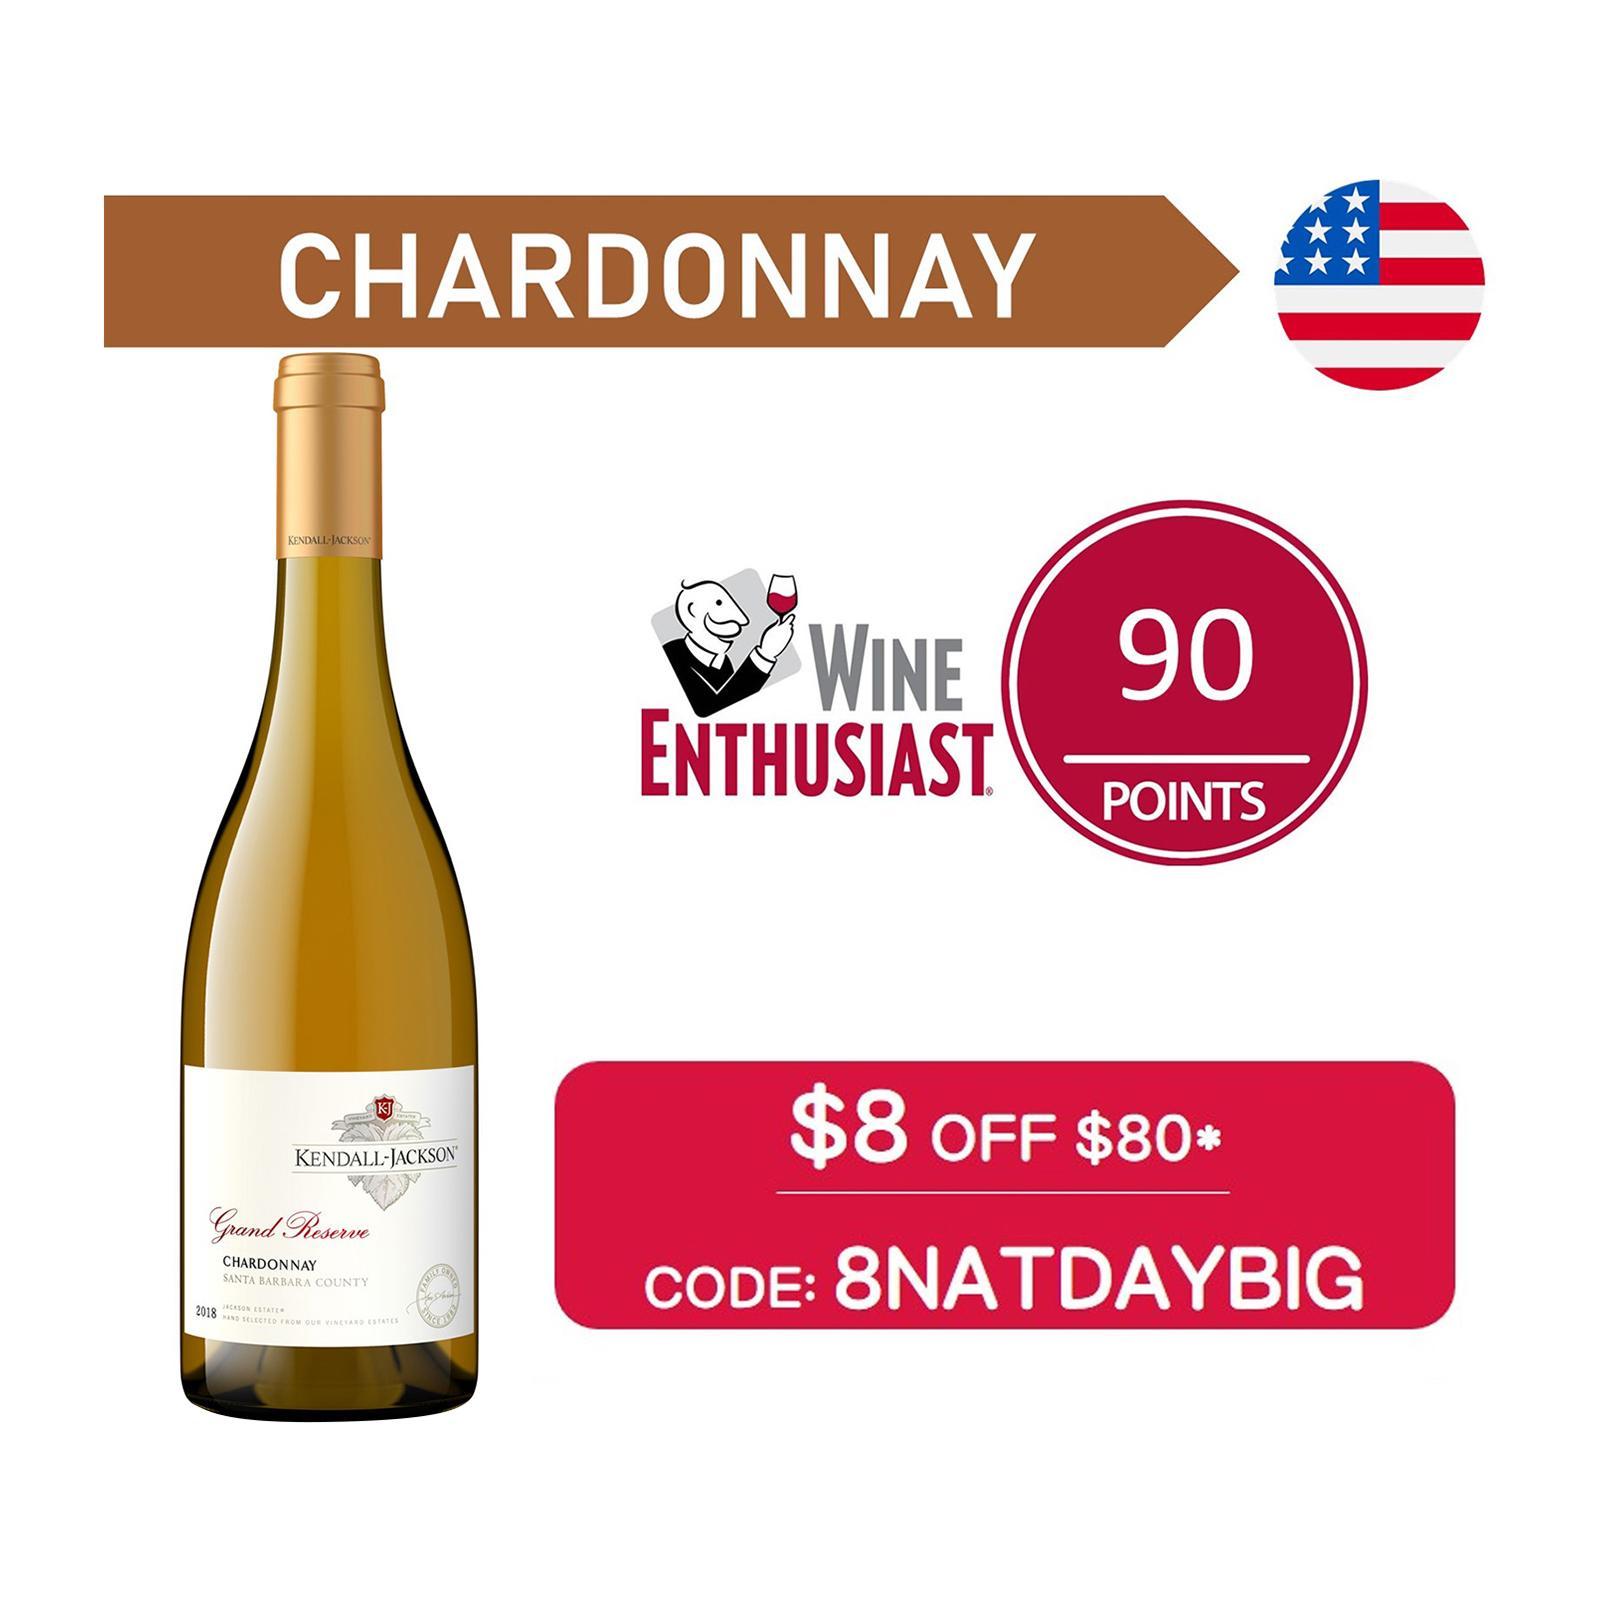 Kendall Jackson Wines Grand Reserve Chardonnay